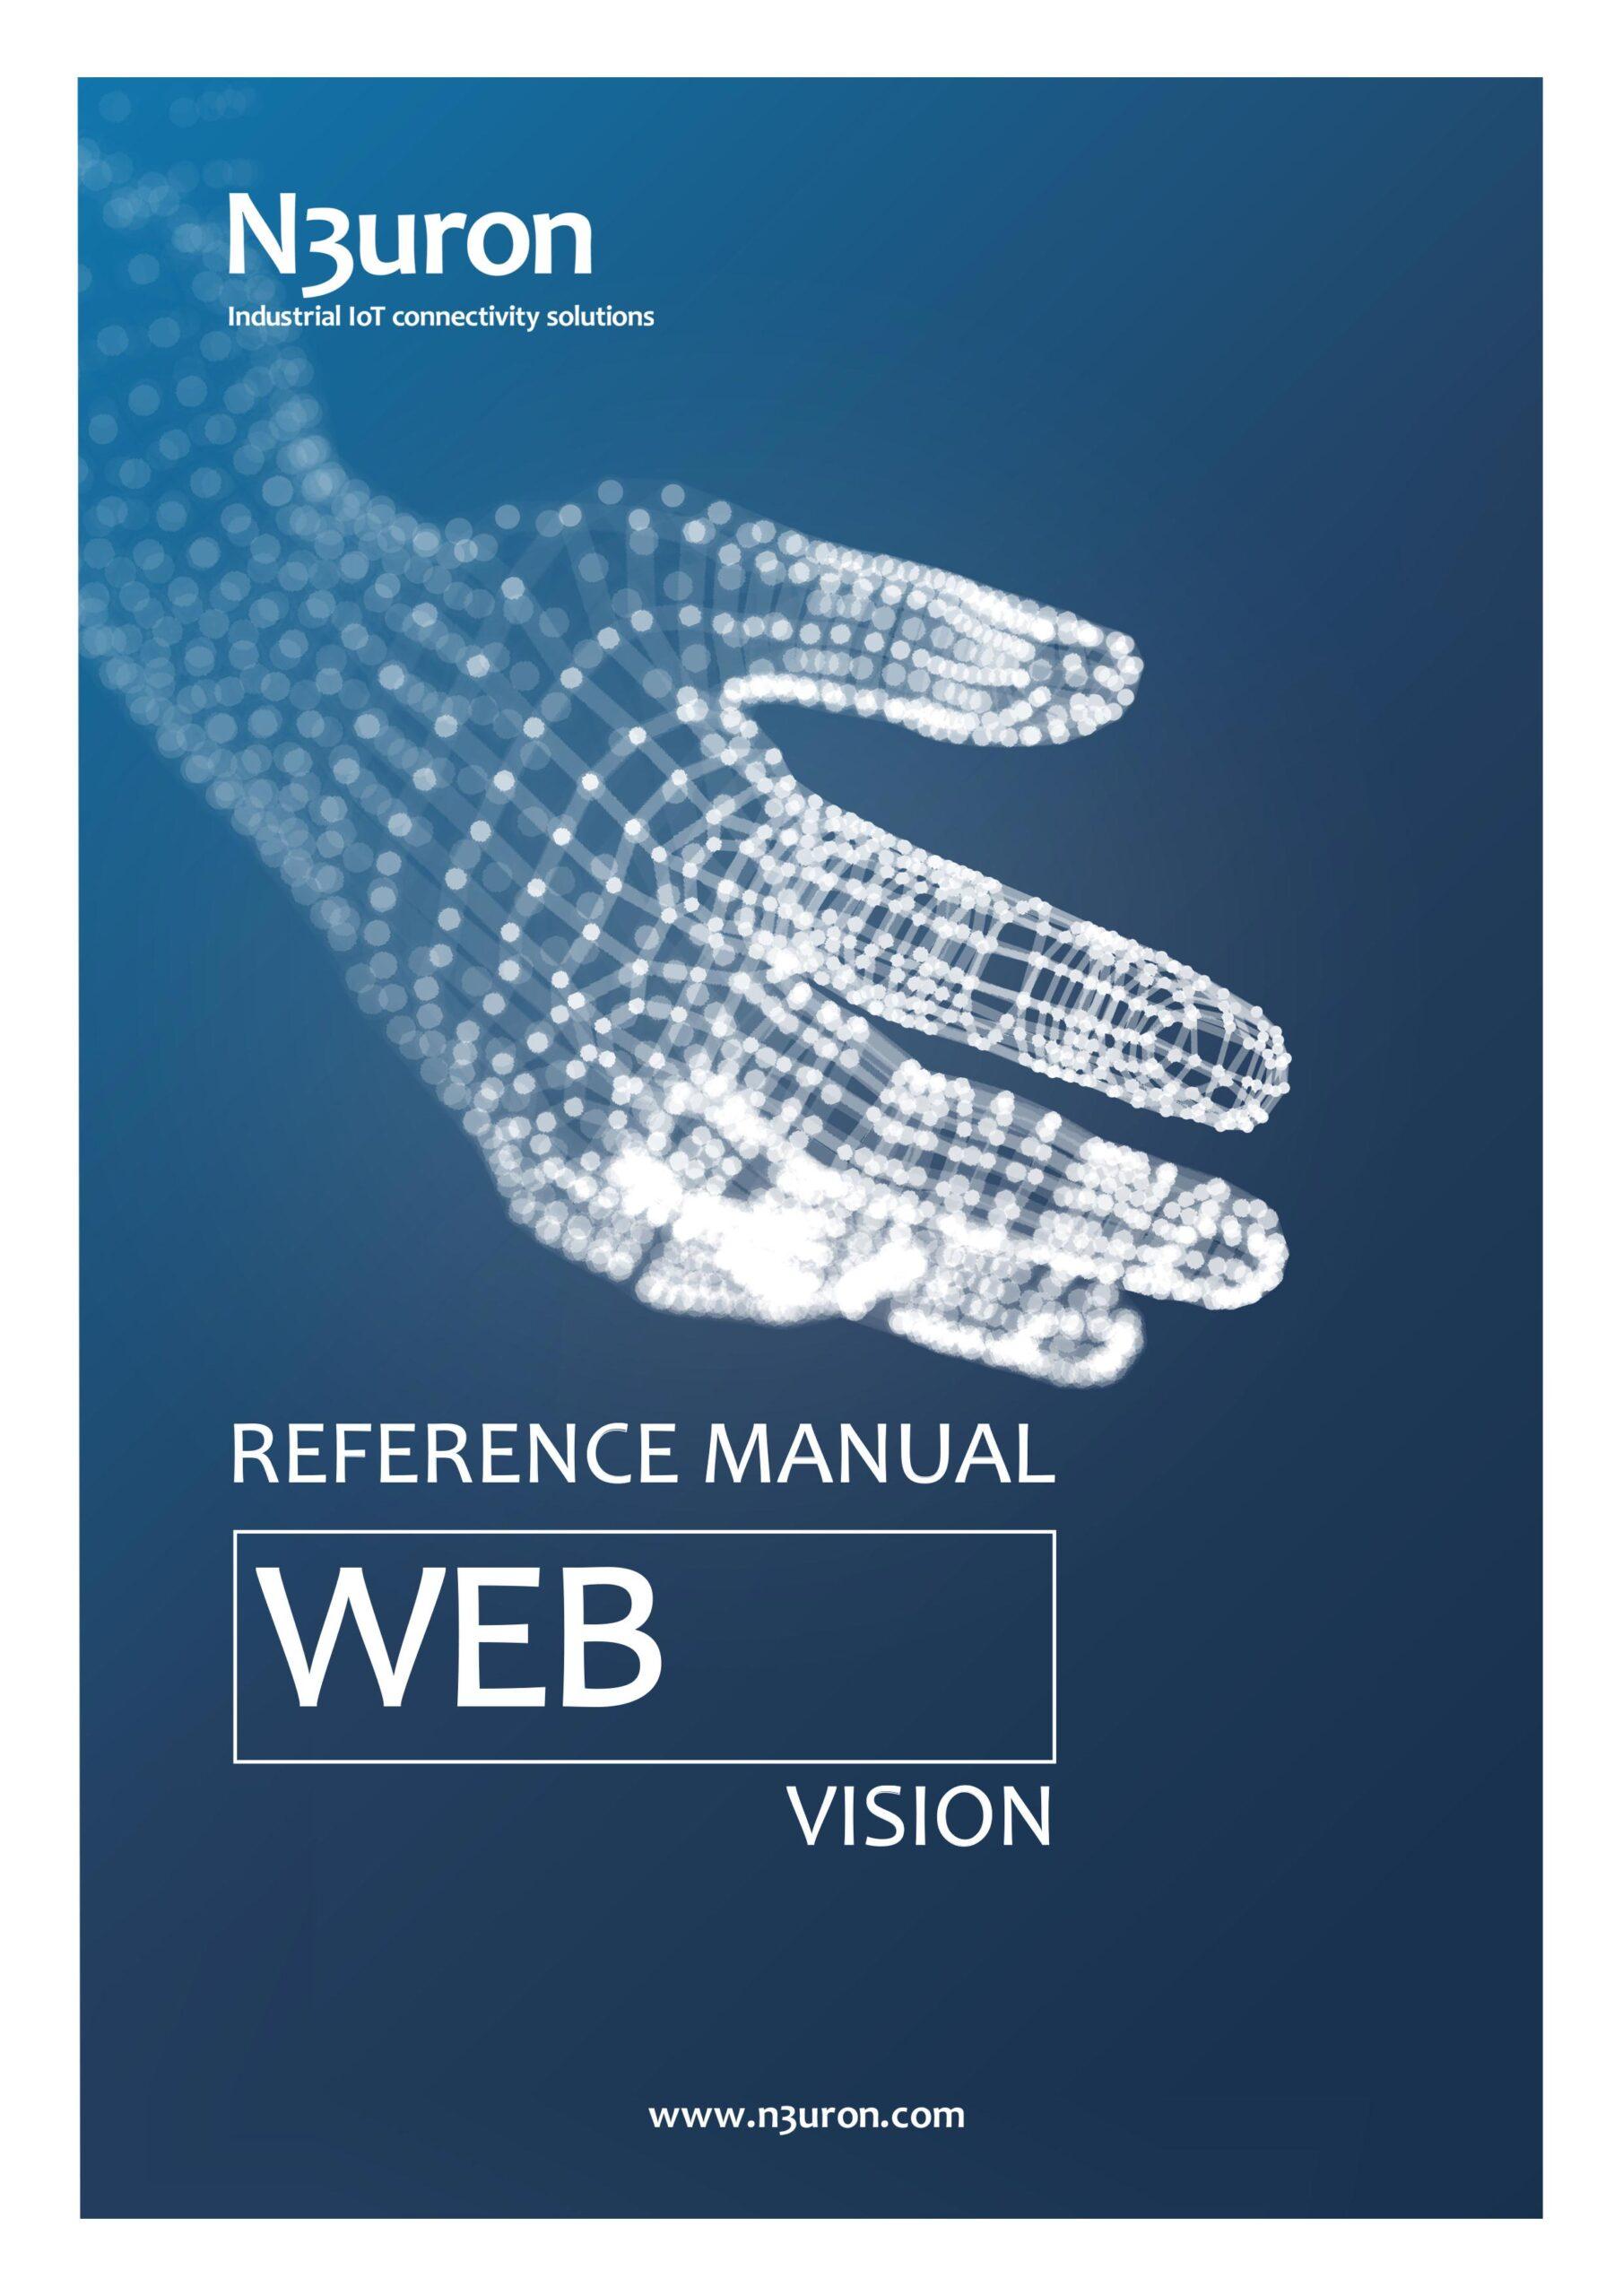 N3uron Industrial IoT communication platform Web Vision Manual Cover